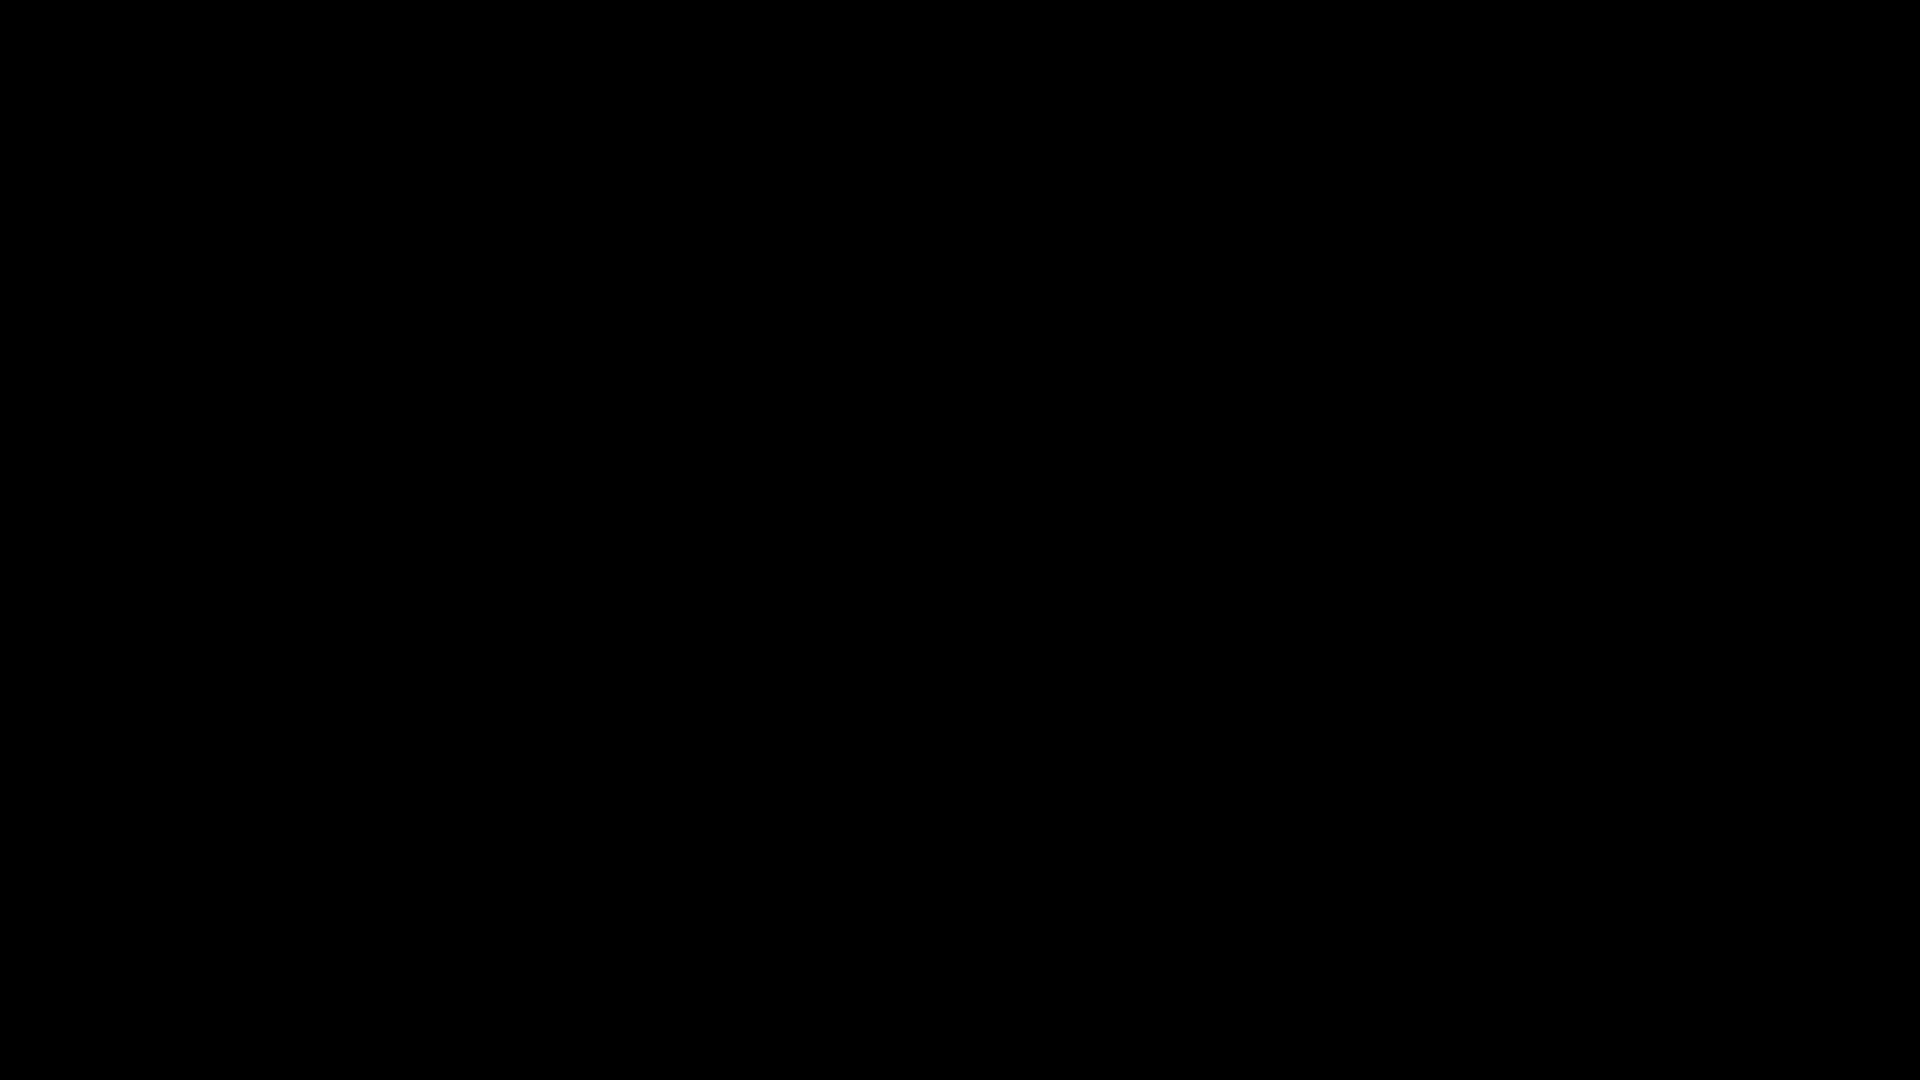 1920x1080-opacityC9E1DCBE-1EE0-9E25-D42B-75F6145FB9AE.png